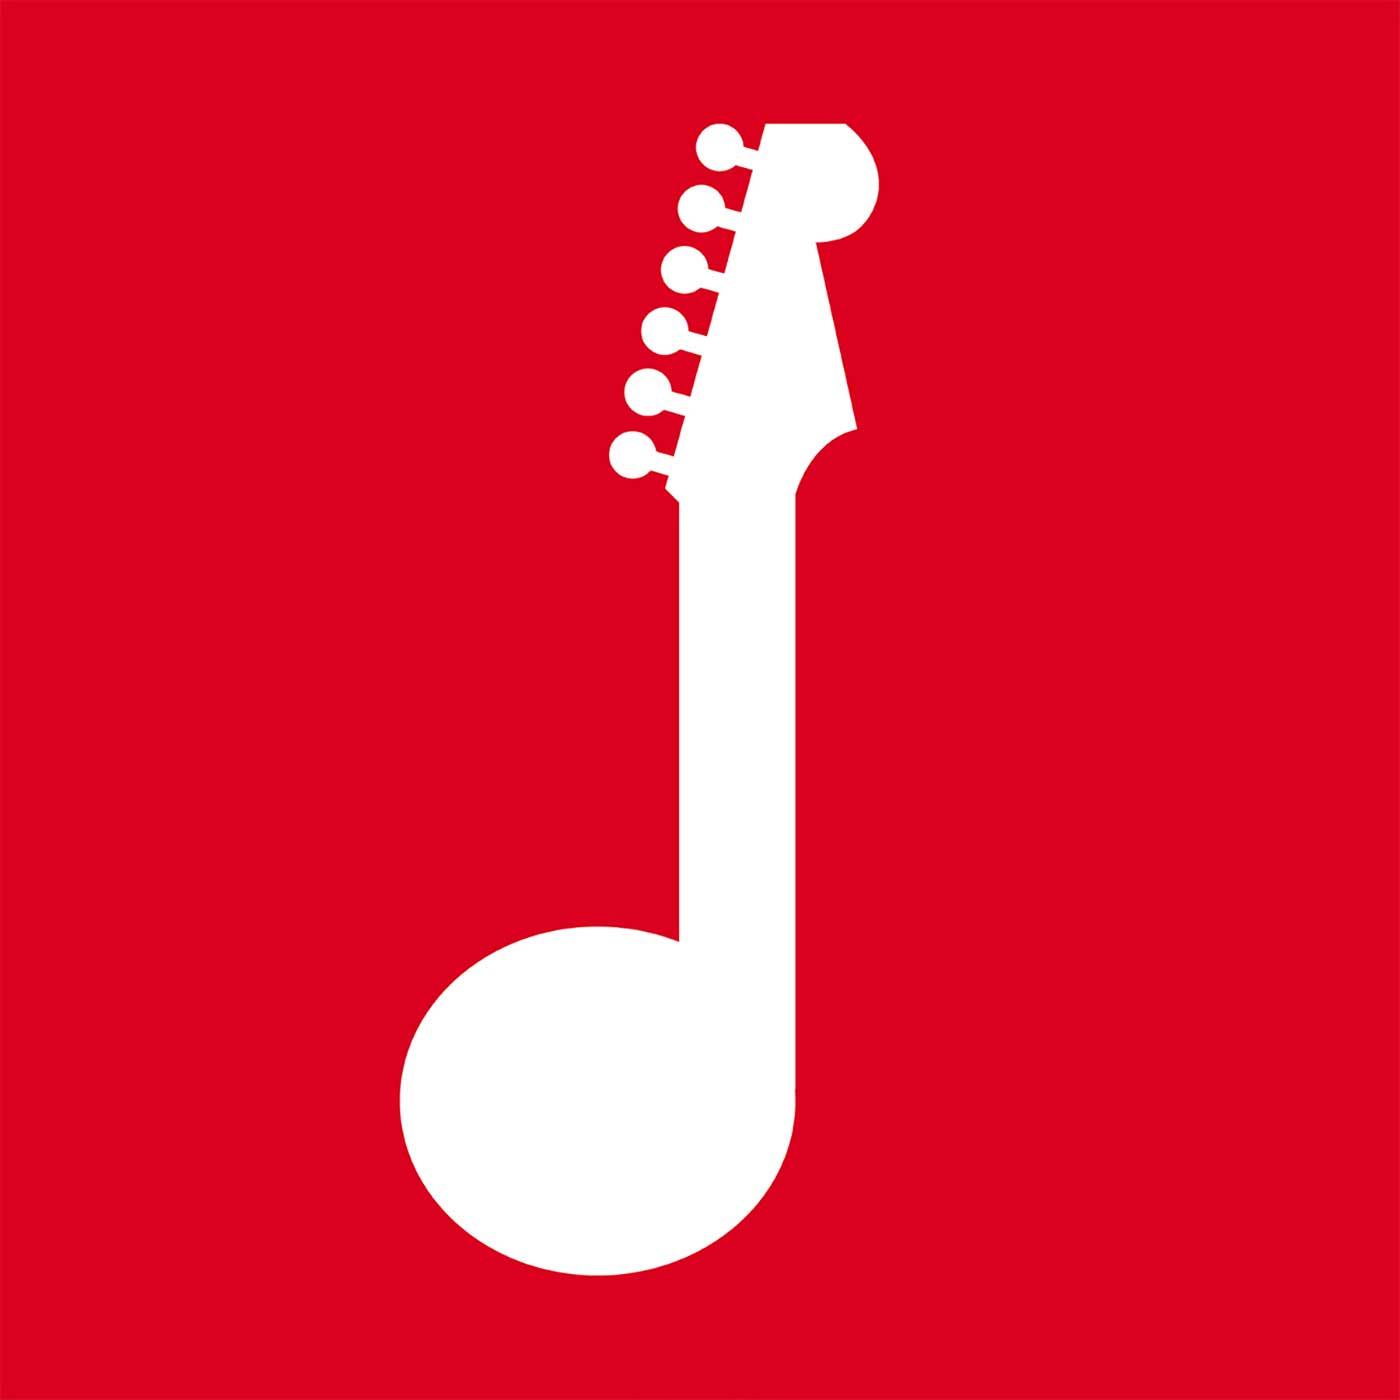 Play Guitar Notes